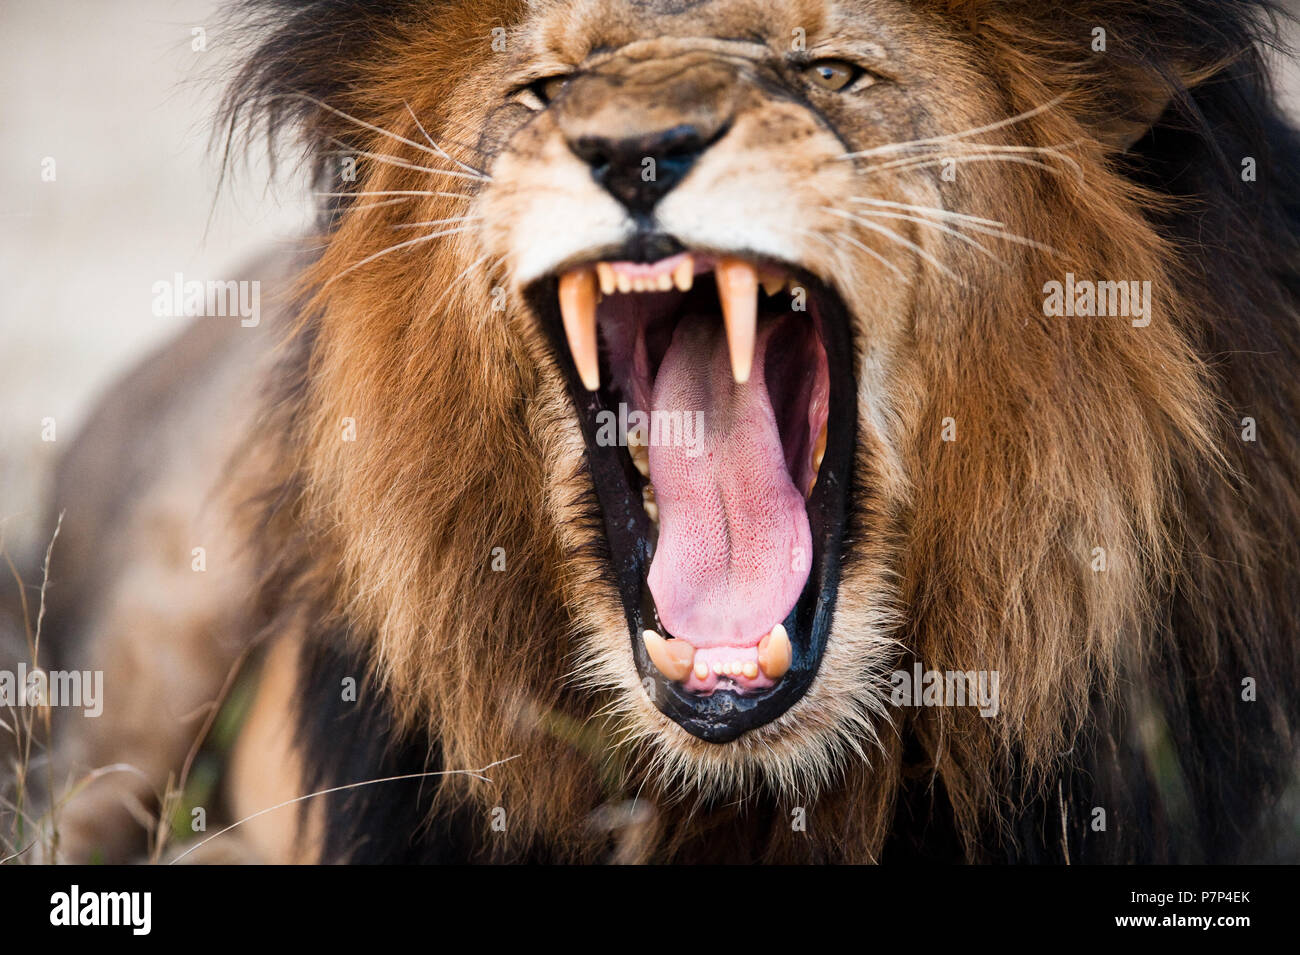 Wütend brüllenden Löwen, Krüger Nationalpark, Südafrika Stockfoto